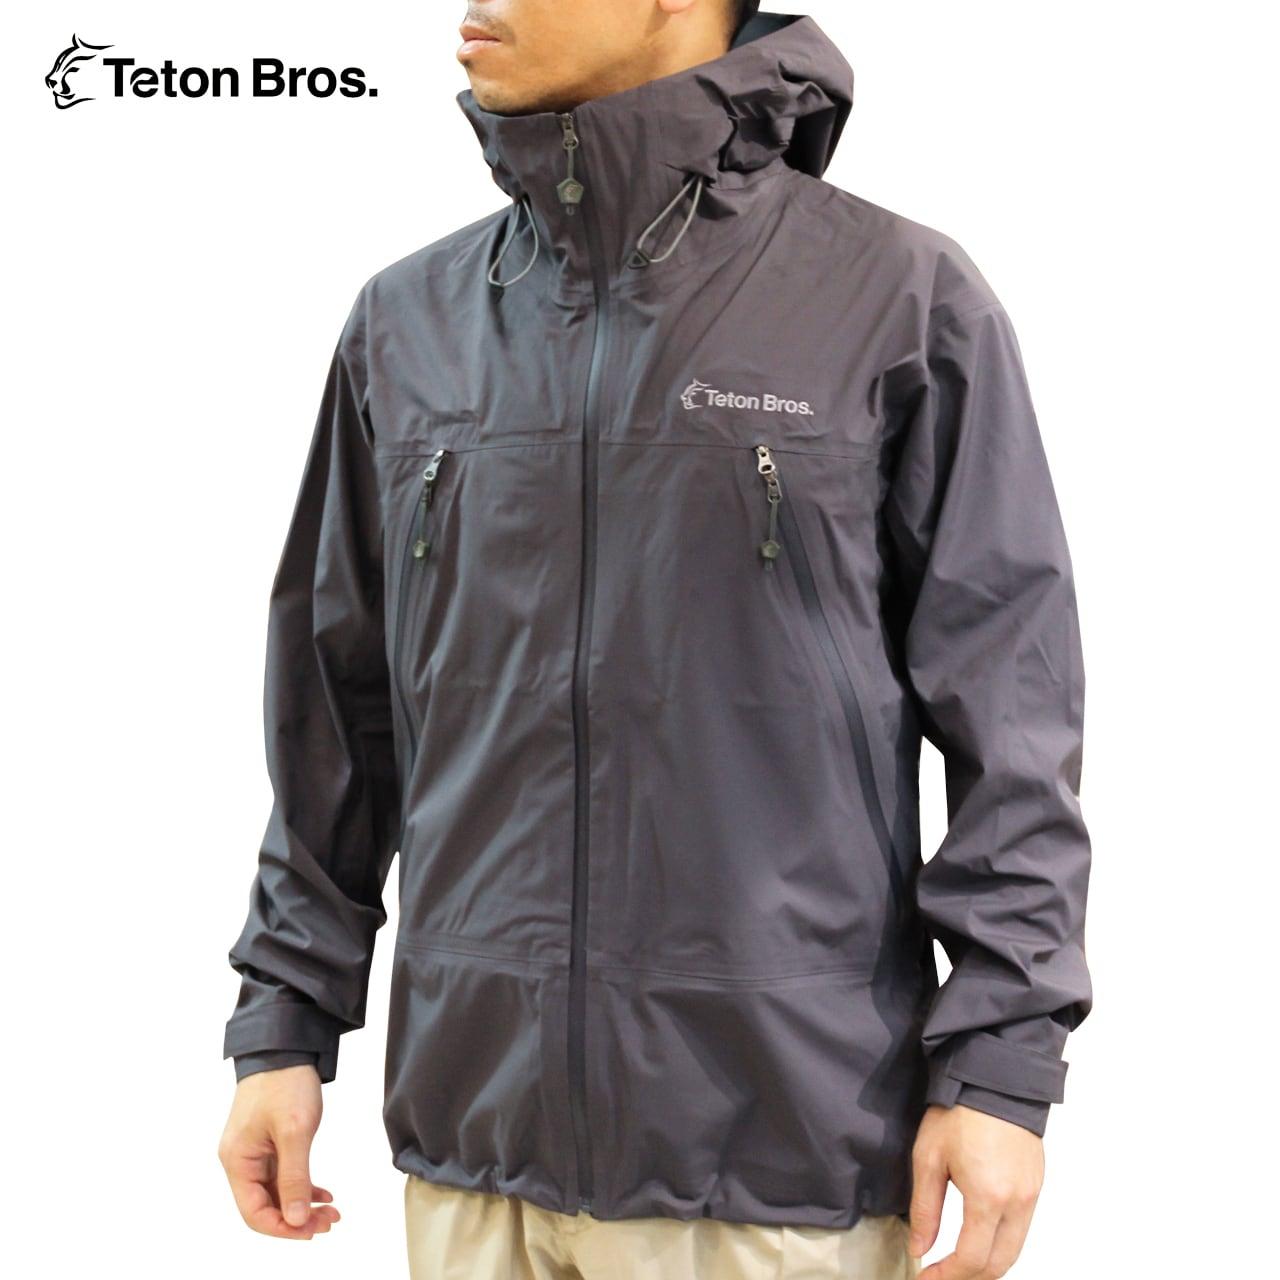 Teton Bros.  Yari Jacket 2.0